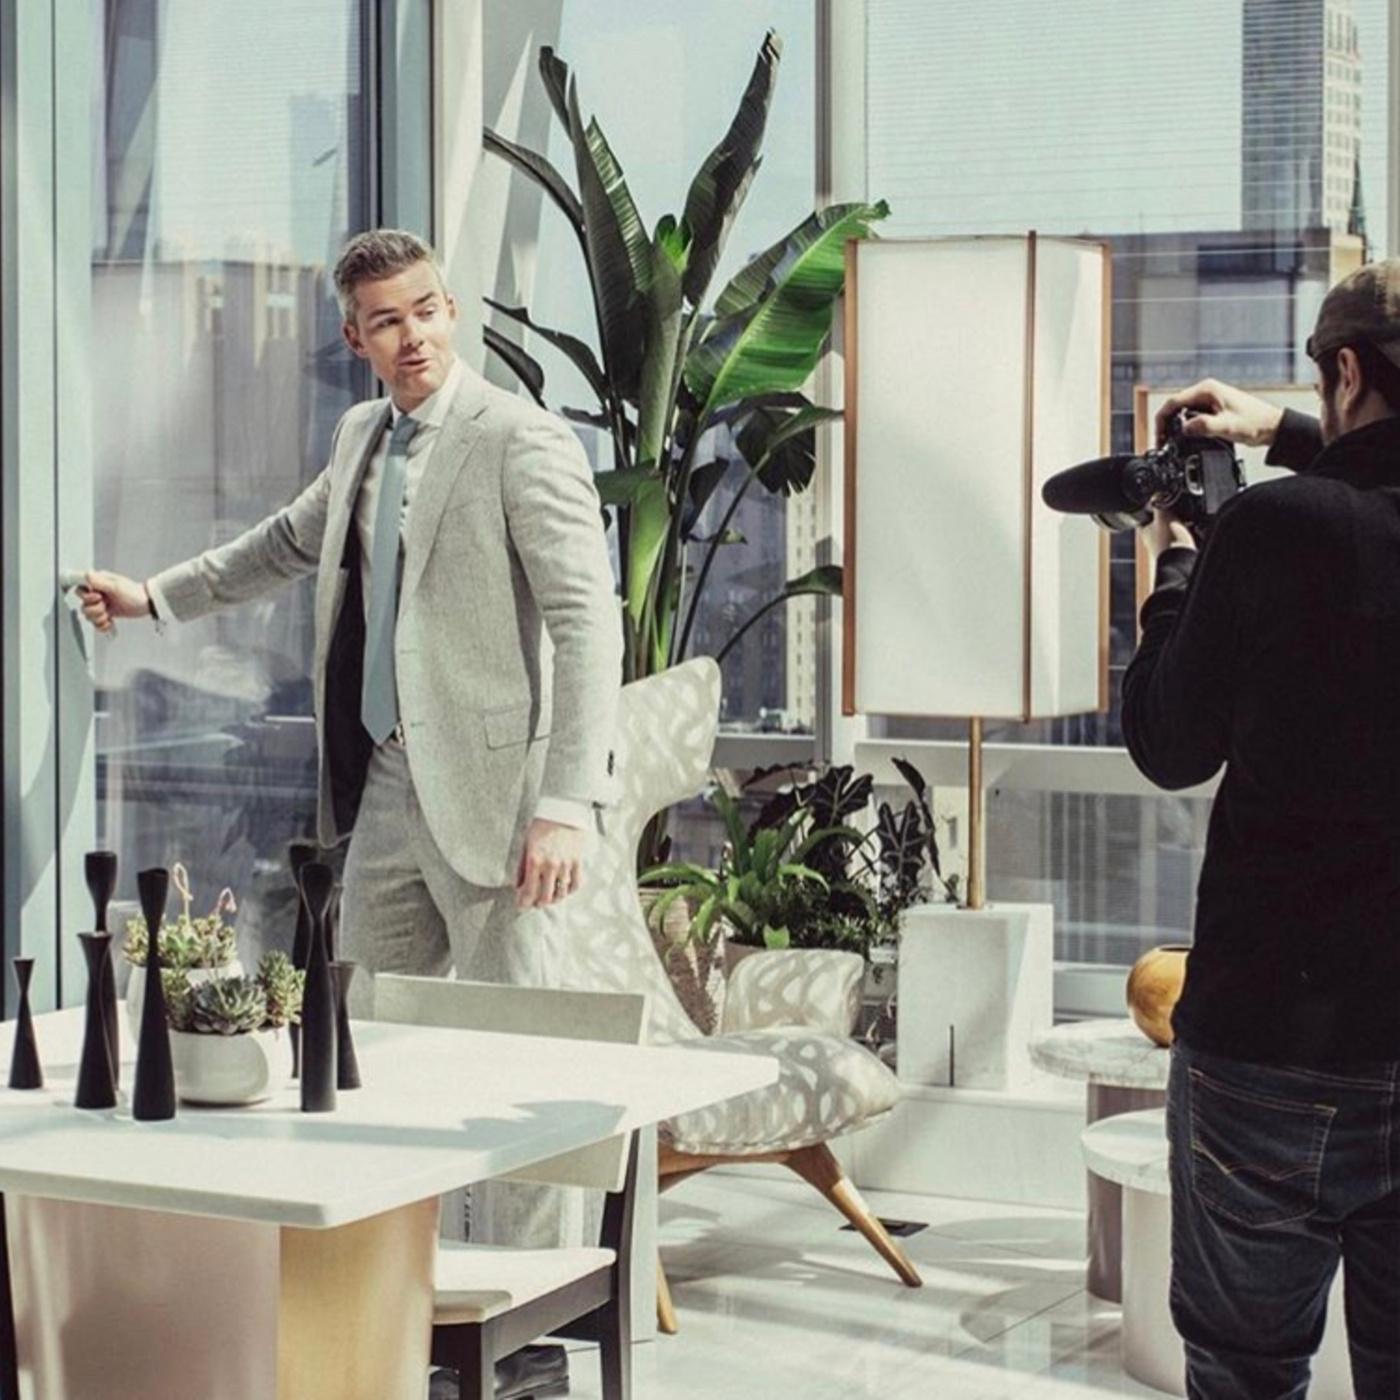 Adam Hamwey - Creative Director for Ryan Serhant of Million Dollar Listing